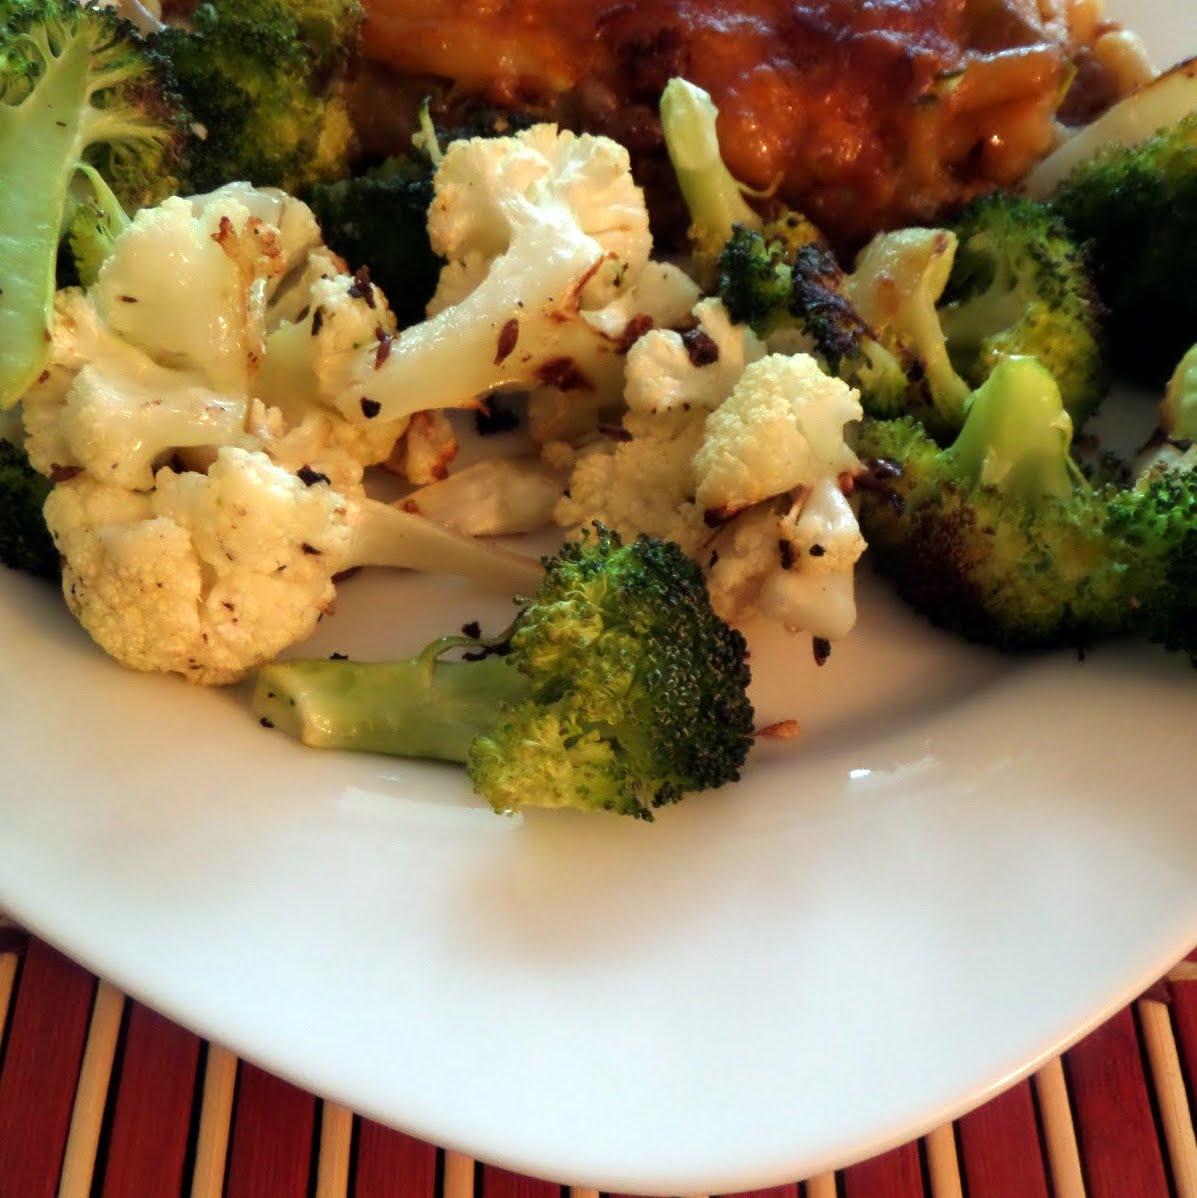 Cumined Cauliflower and Broccoli: A simple vegetable side dish of roasted cauliflower and broccoli with cumin seeds.